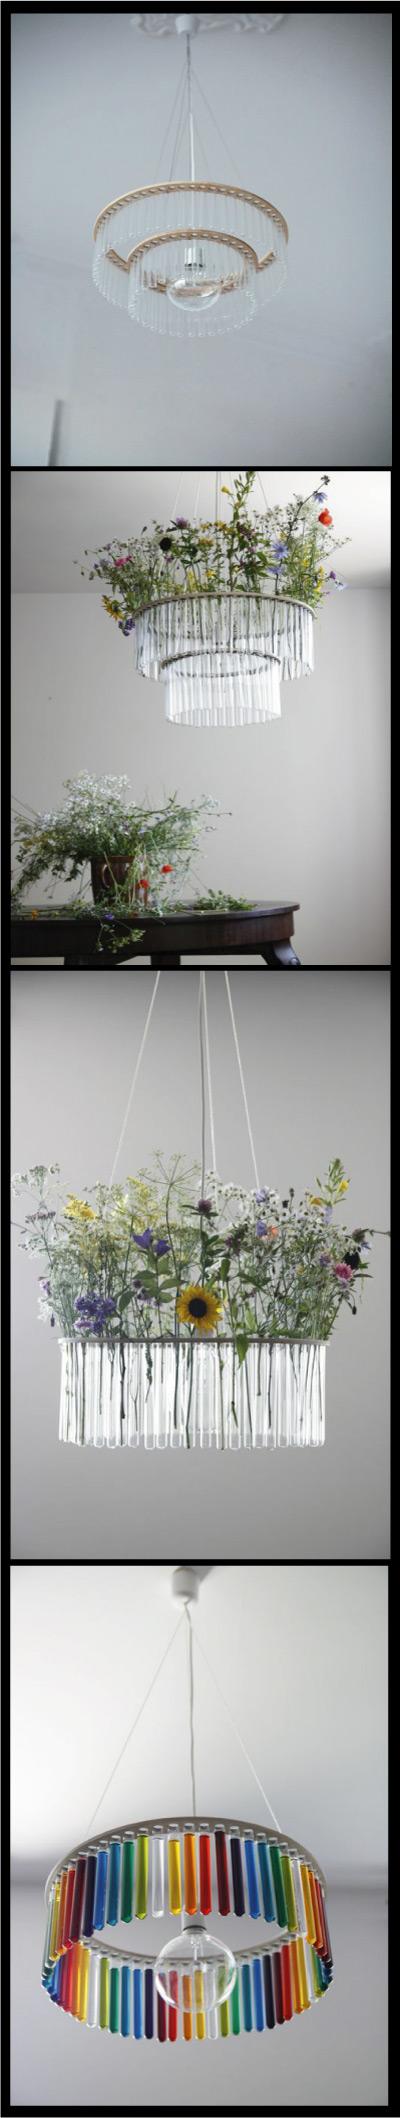 maria-lampe eco-design- design studio gang - lampe soliflore - chiara stella home